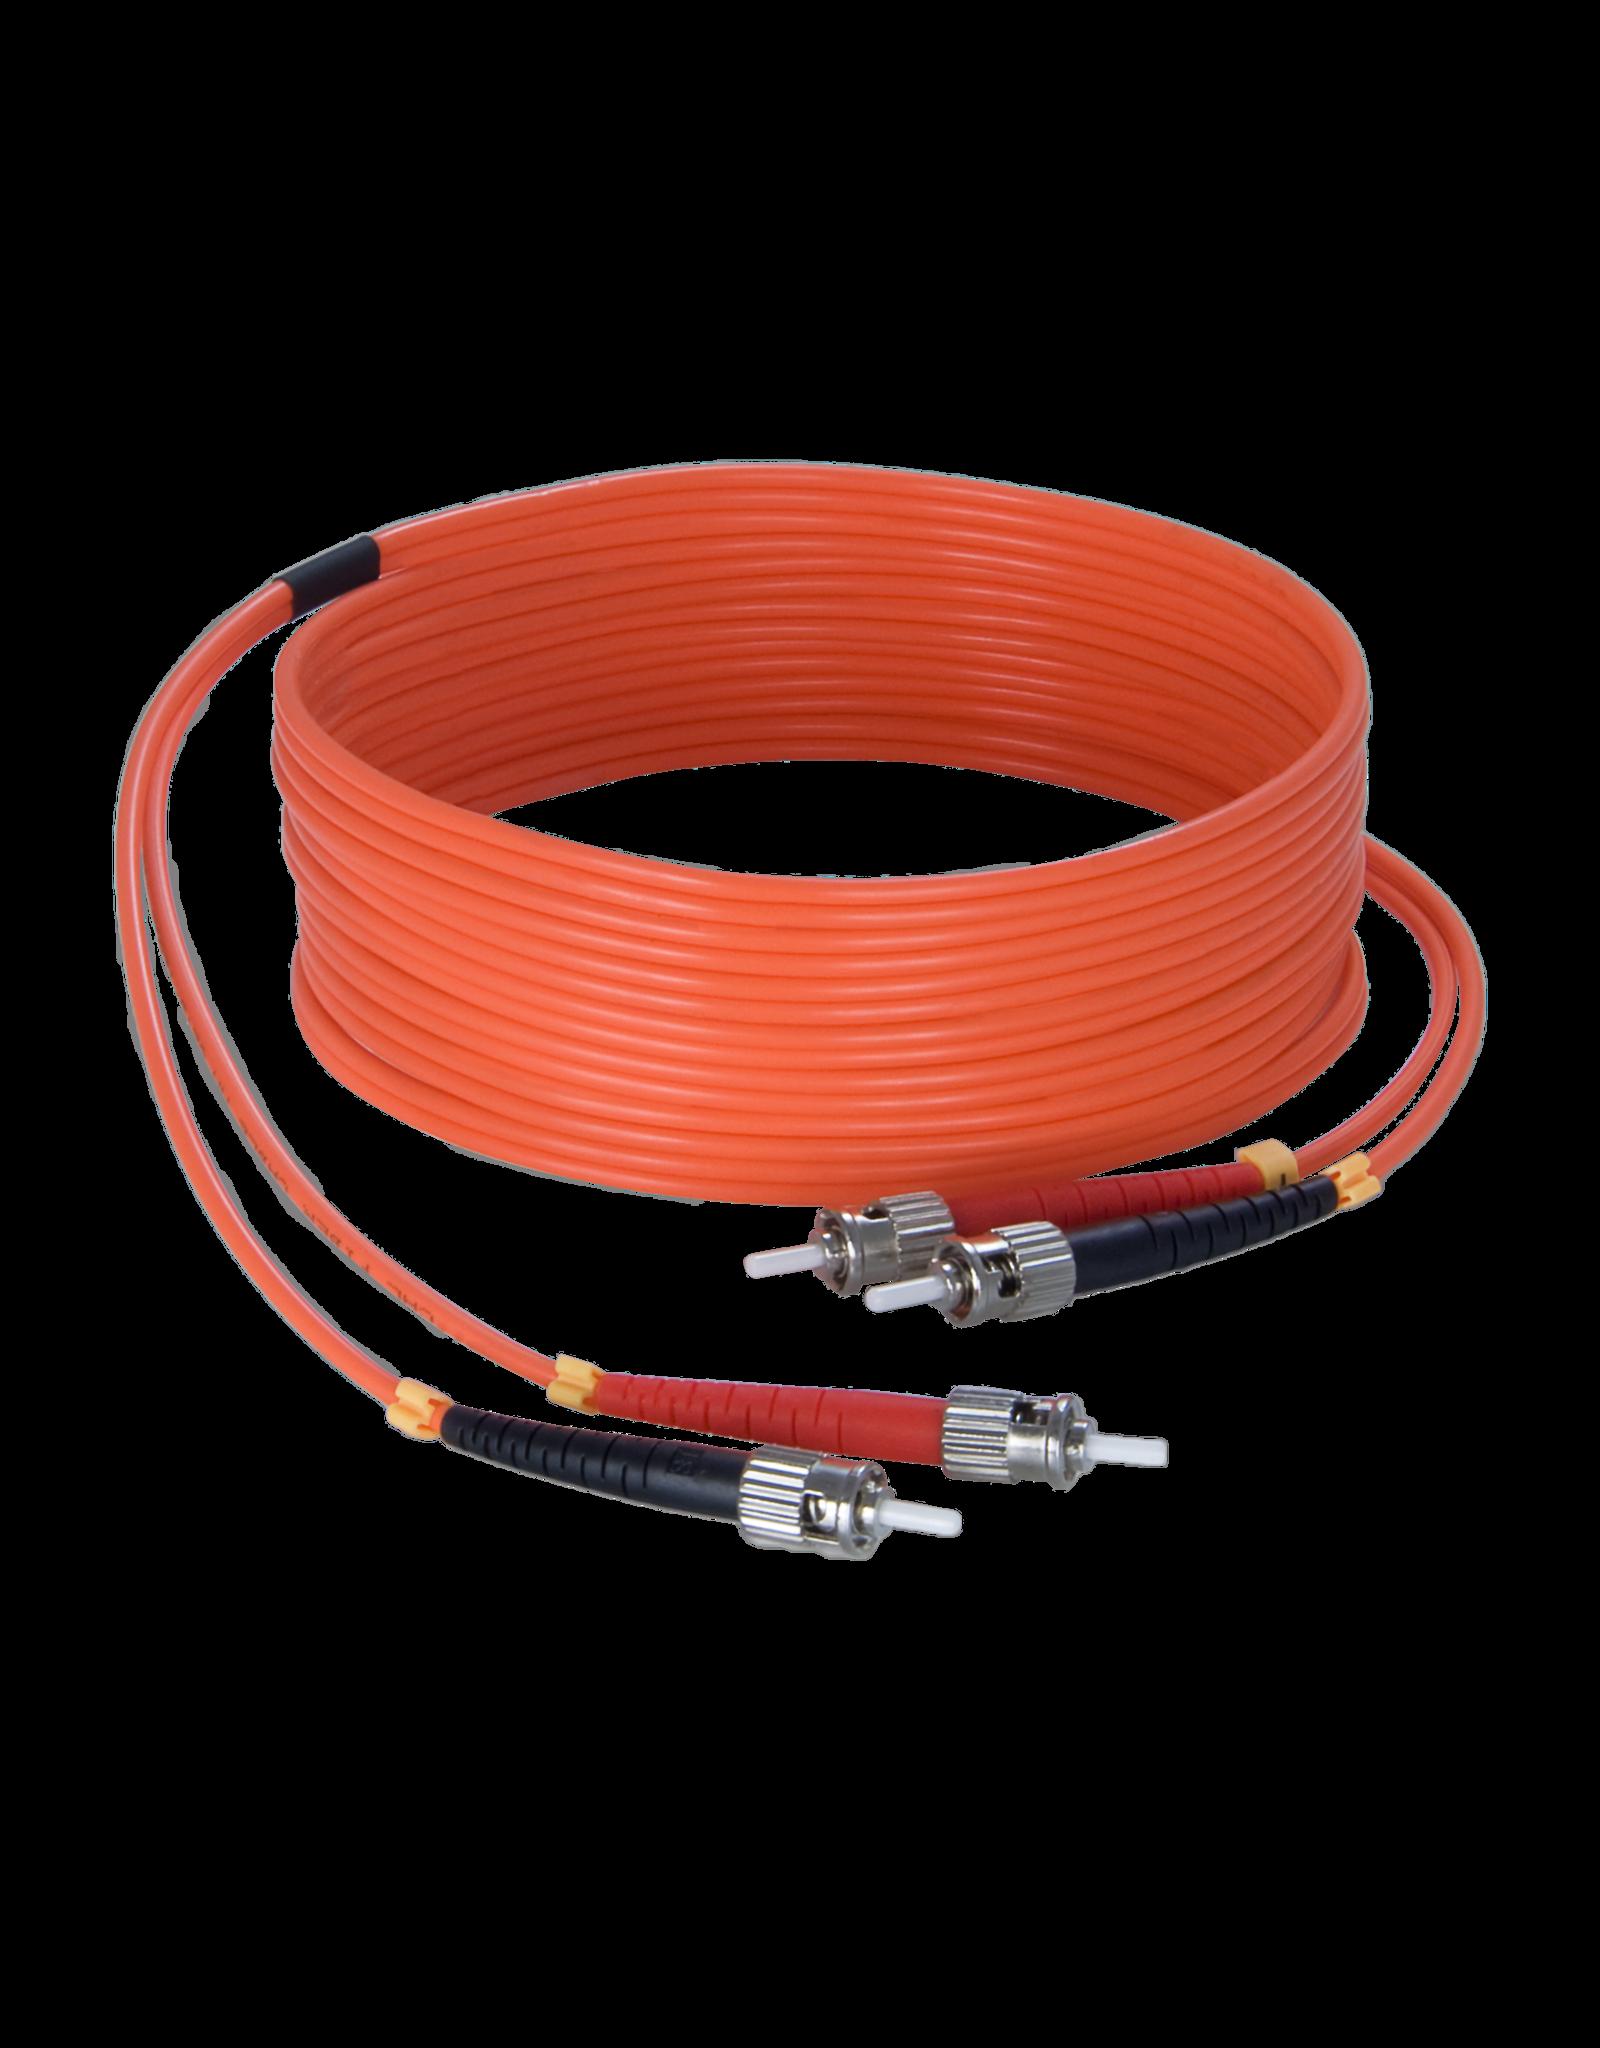 Audac Fiber optic cable - st/pc - st/pc - LSHF 5 meter